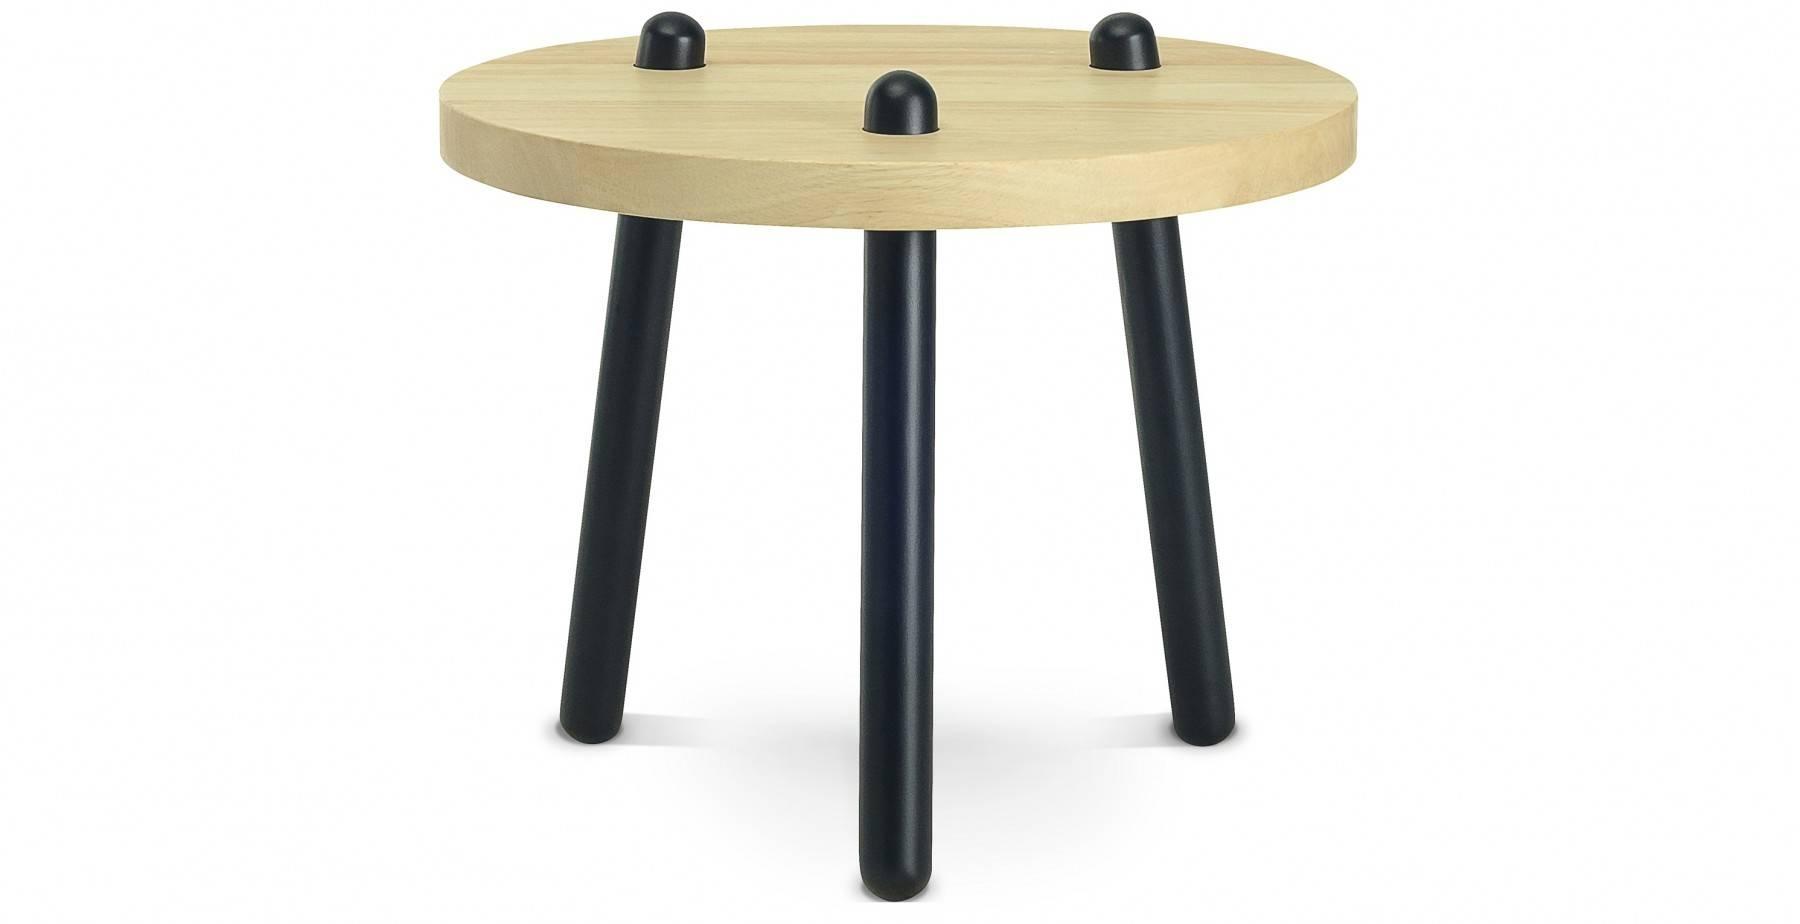 Kimi High Coffee Table, Oak Fern & Grey inside High Coffee Tables (Image 12 of 15)